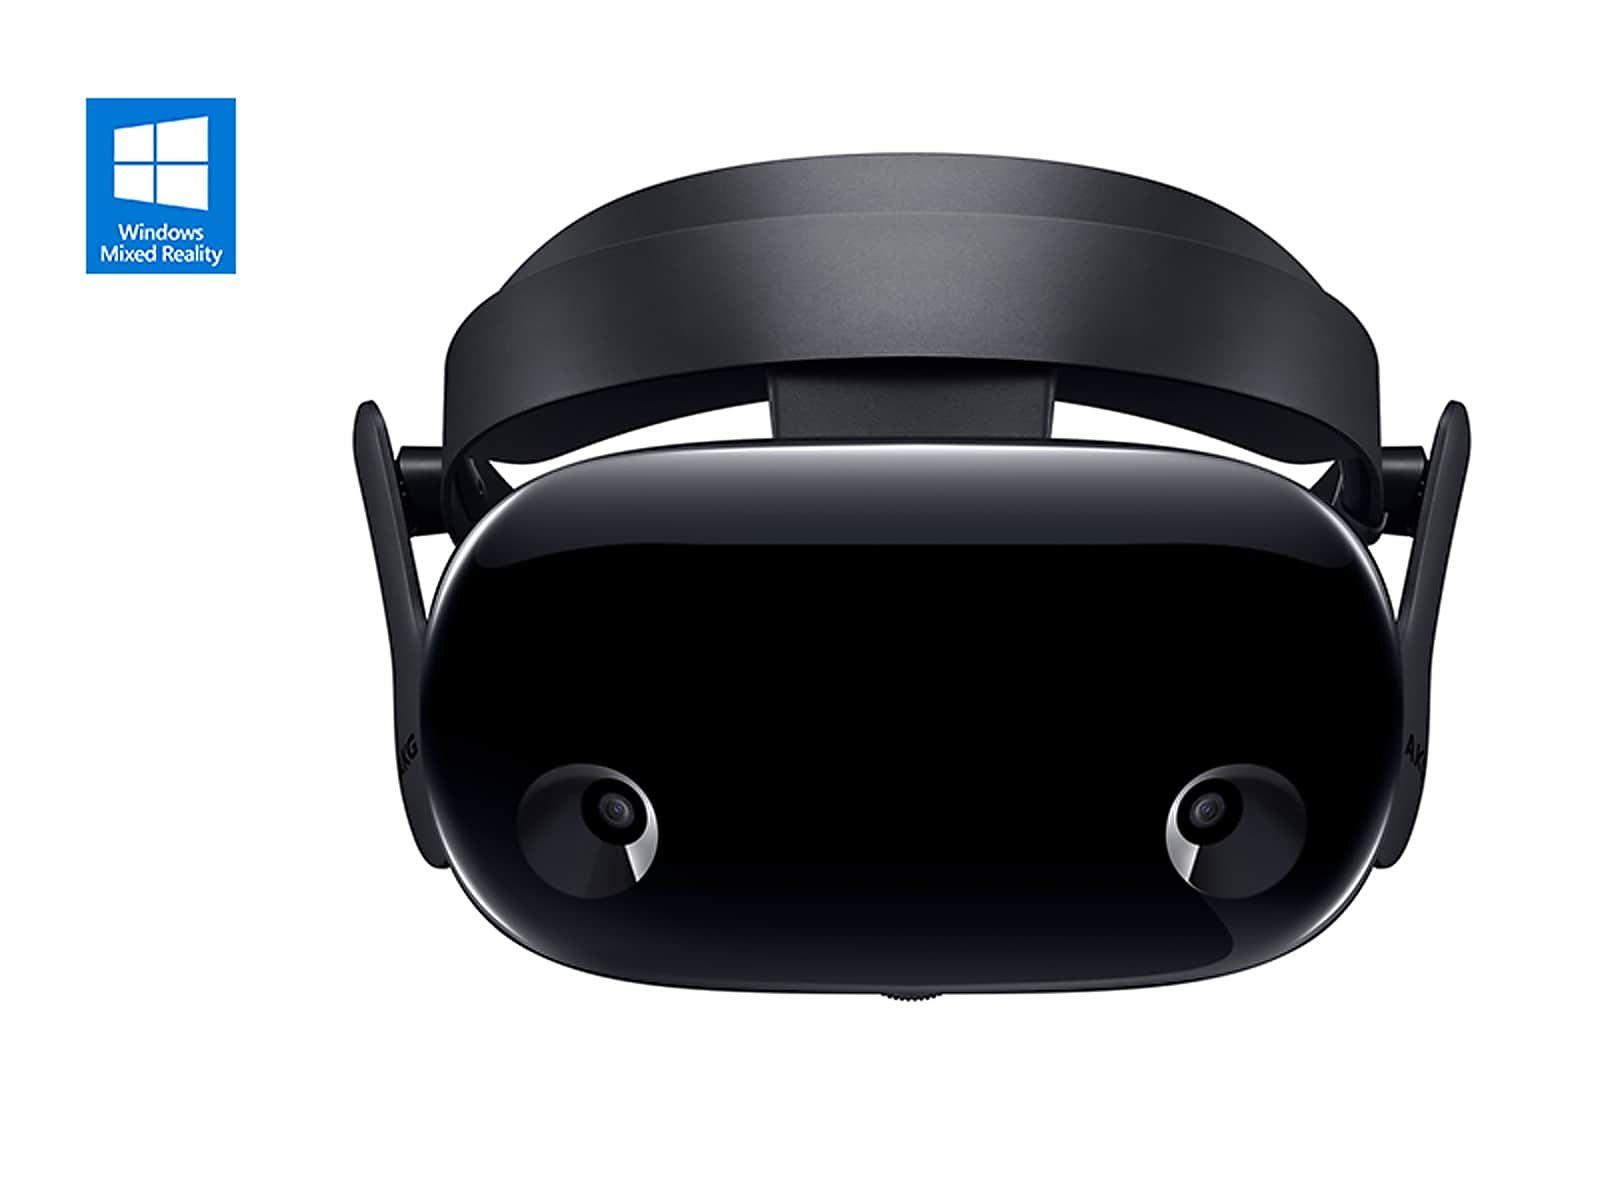 Samsung Hmd Odyssey Windows Mixed Reality Headset Virtual Reality Headset Virtual Reality Headset